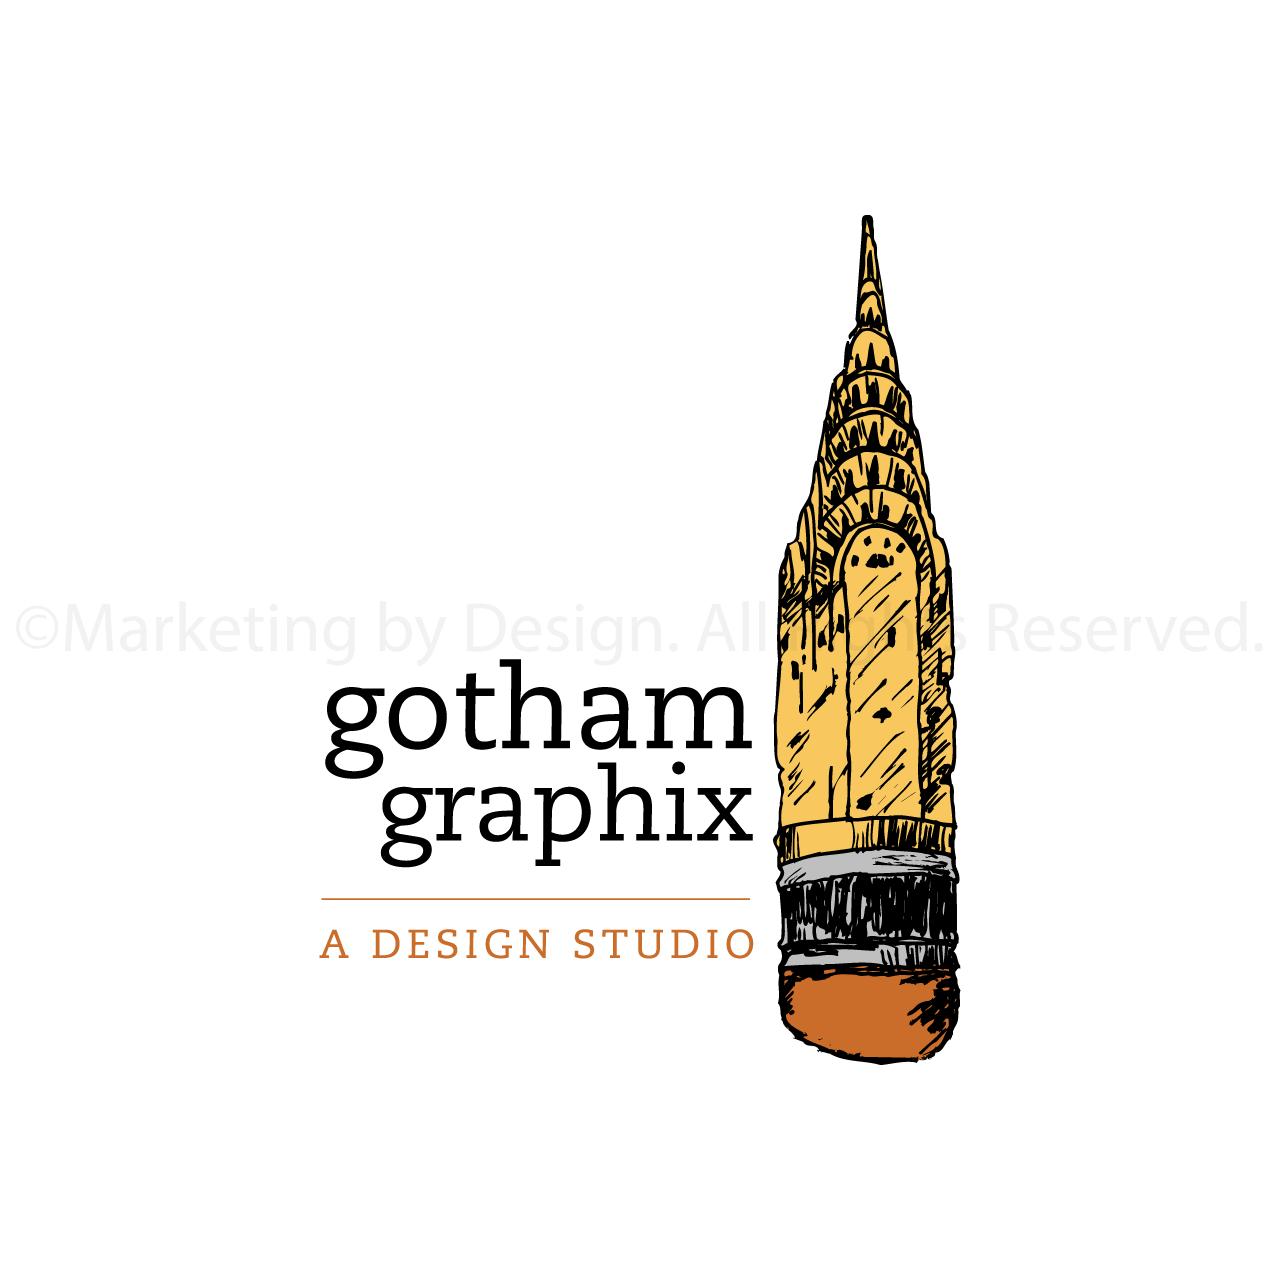 Marketing by Design | Gotham Graphix Logo